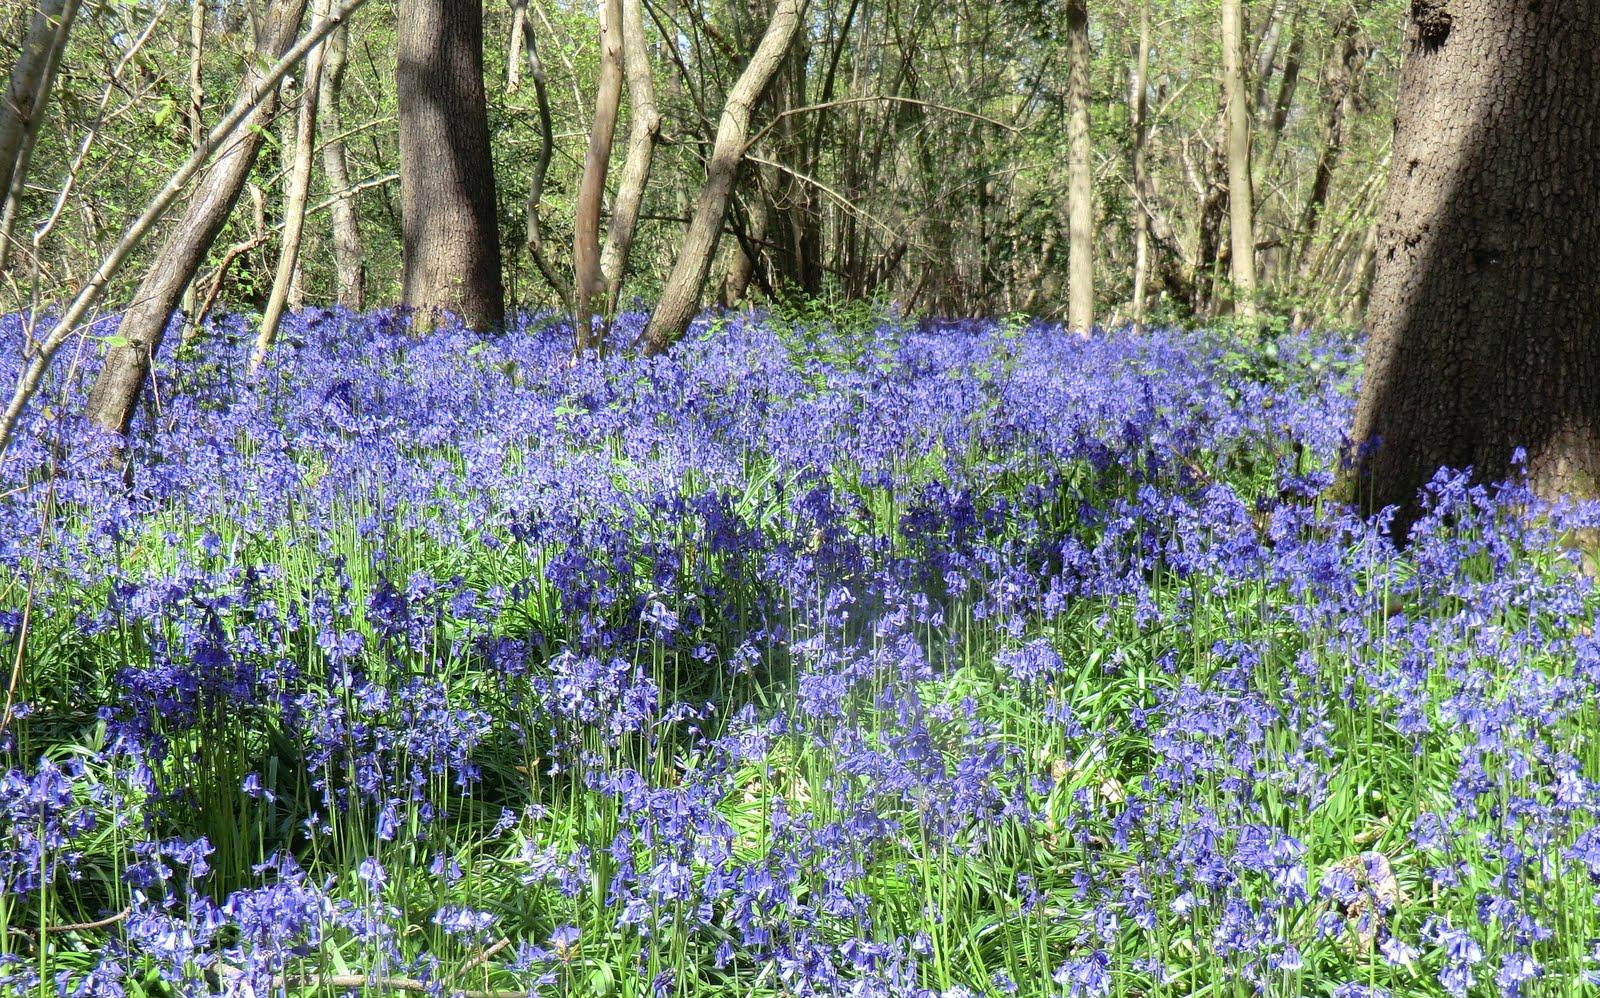 CIMG4194 Selsdon Wood